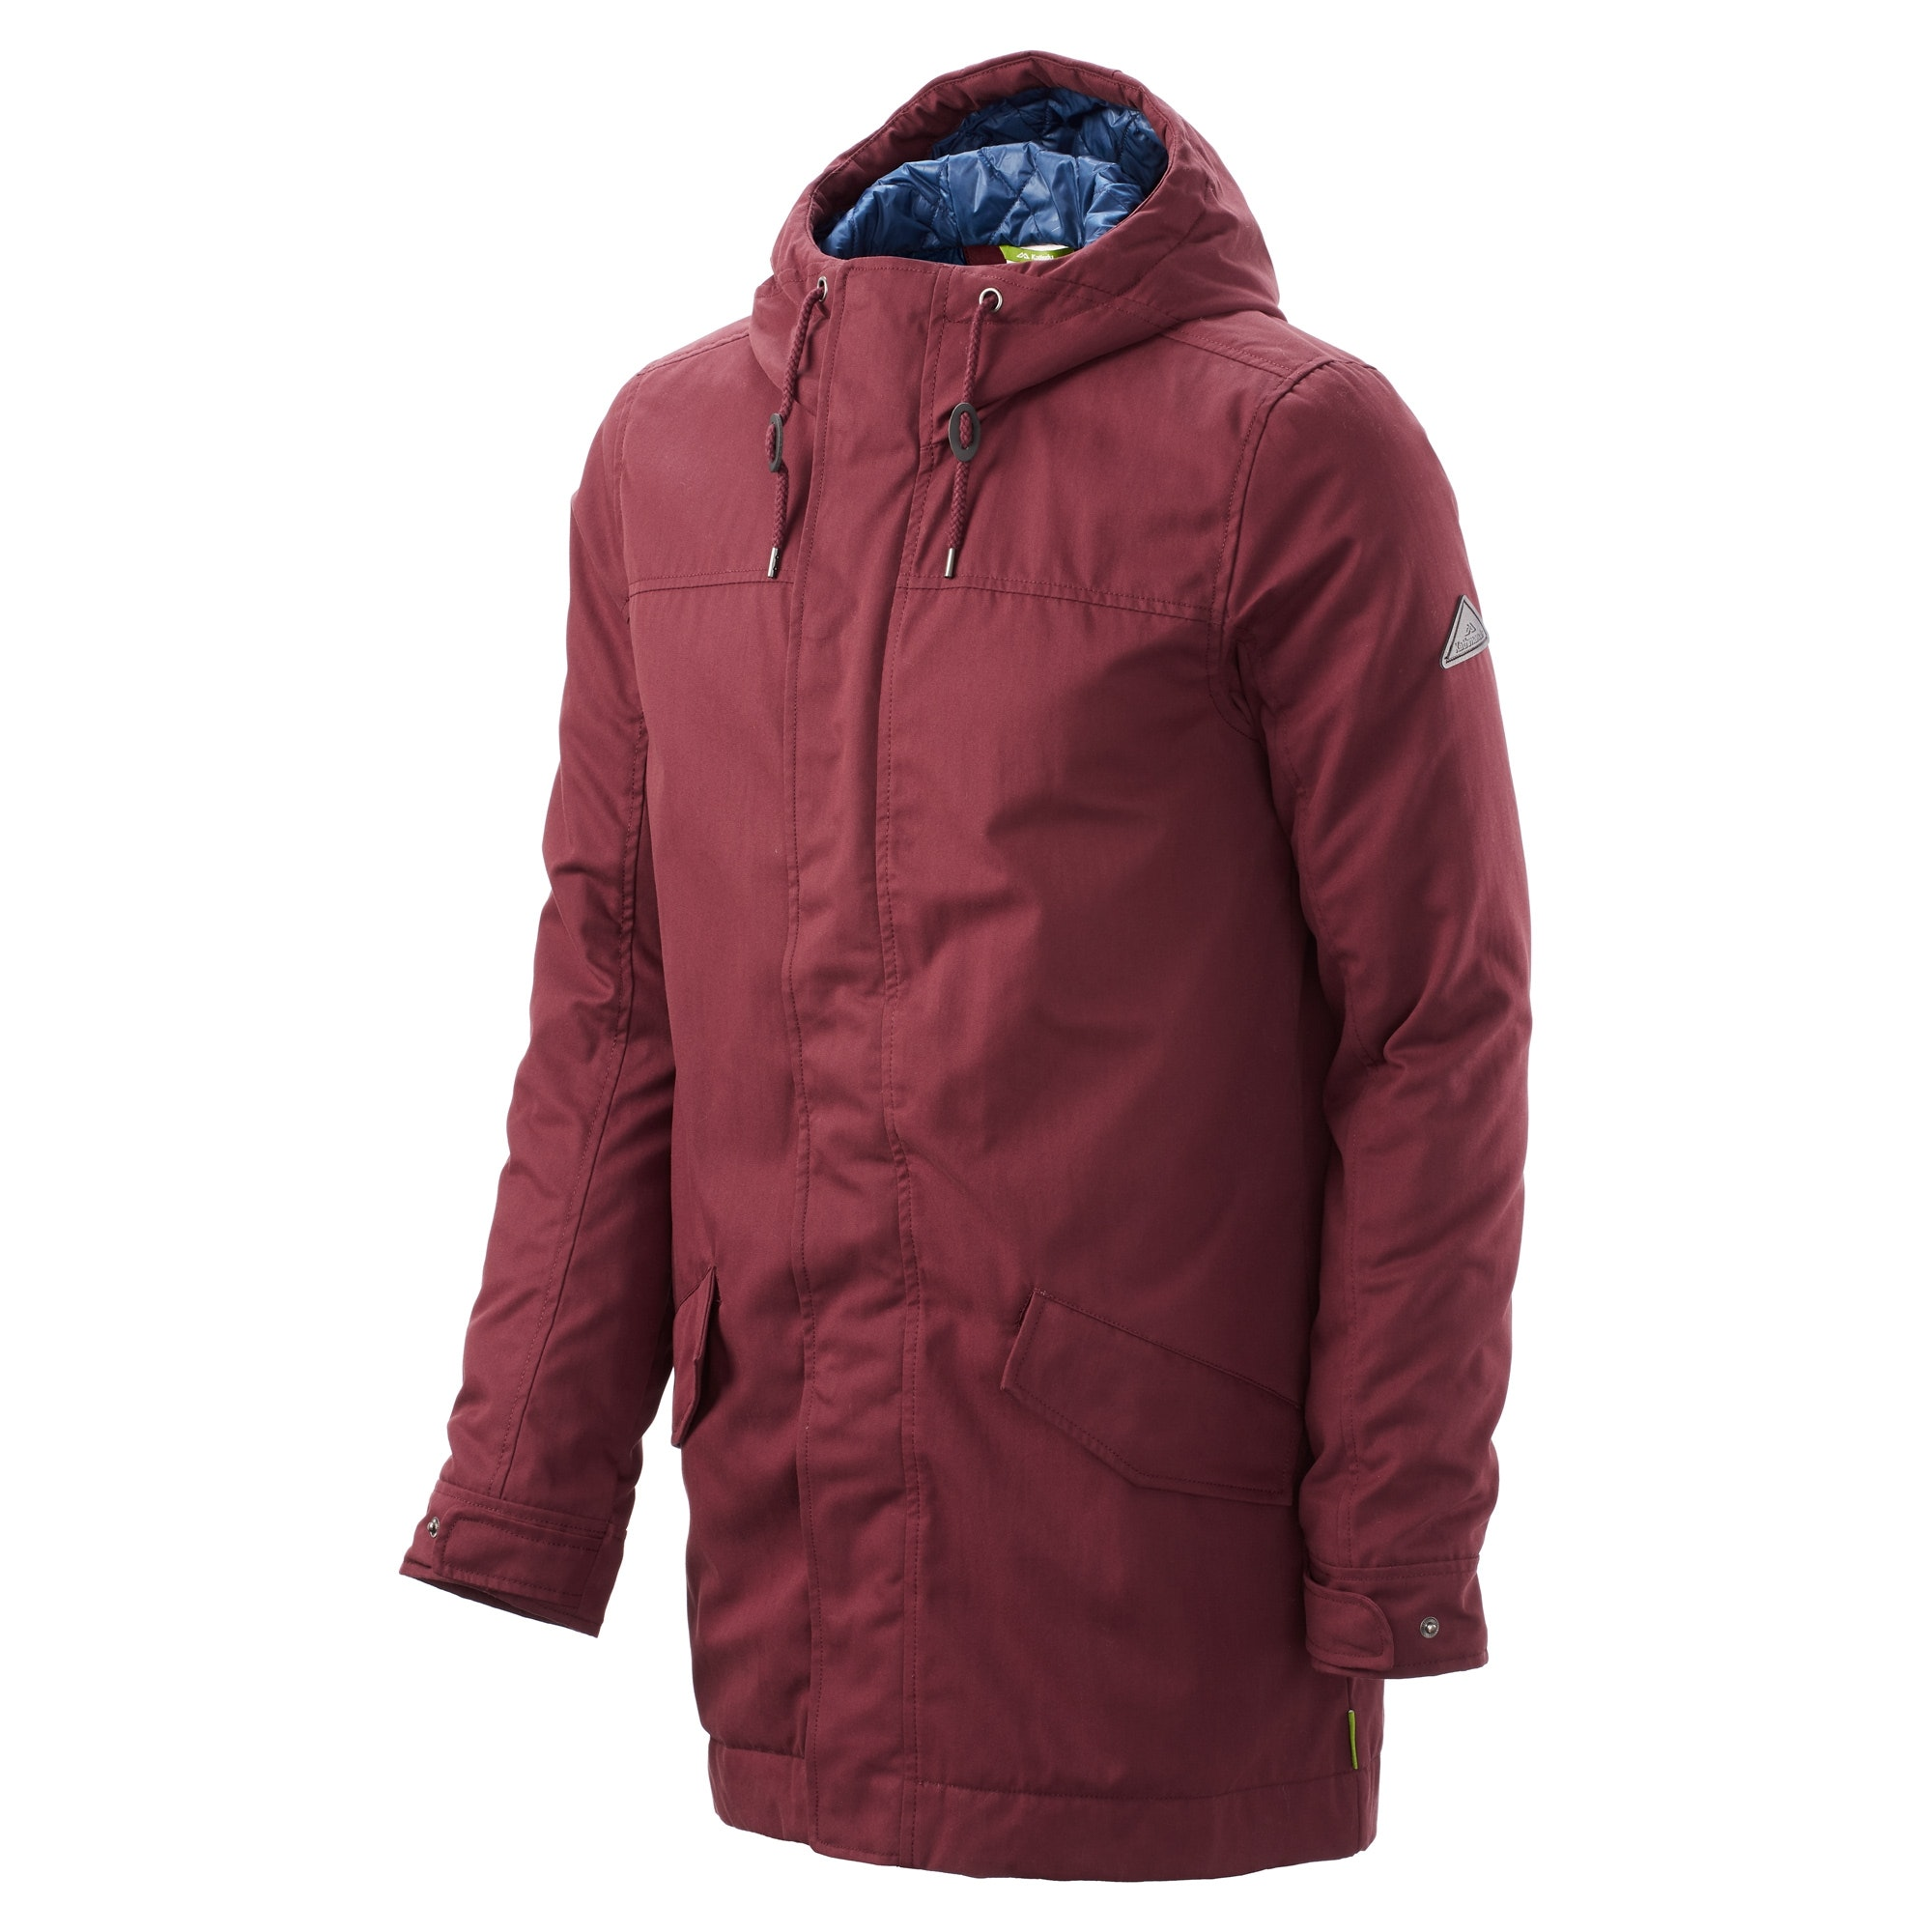 Kathmandu-Creede-Men-039-s-insuLITE-Longline-Urban-Parka-Hooded-Outdoor-Coat-v2